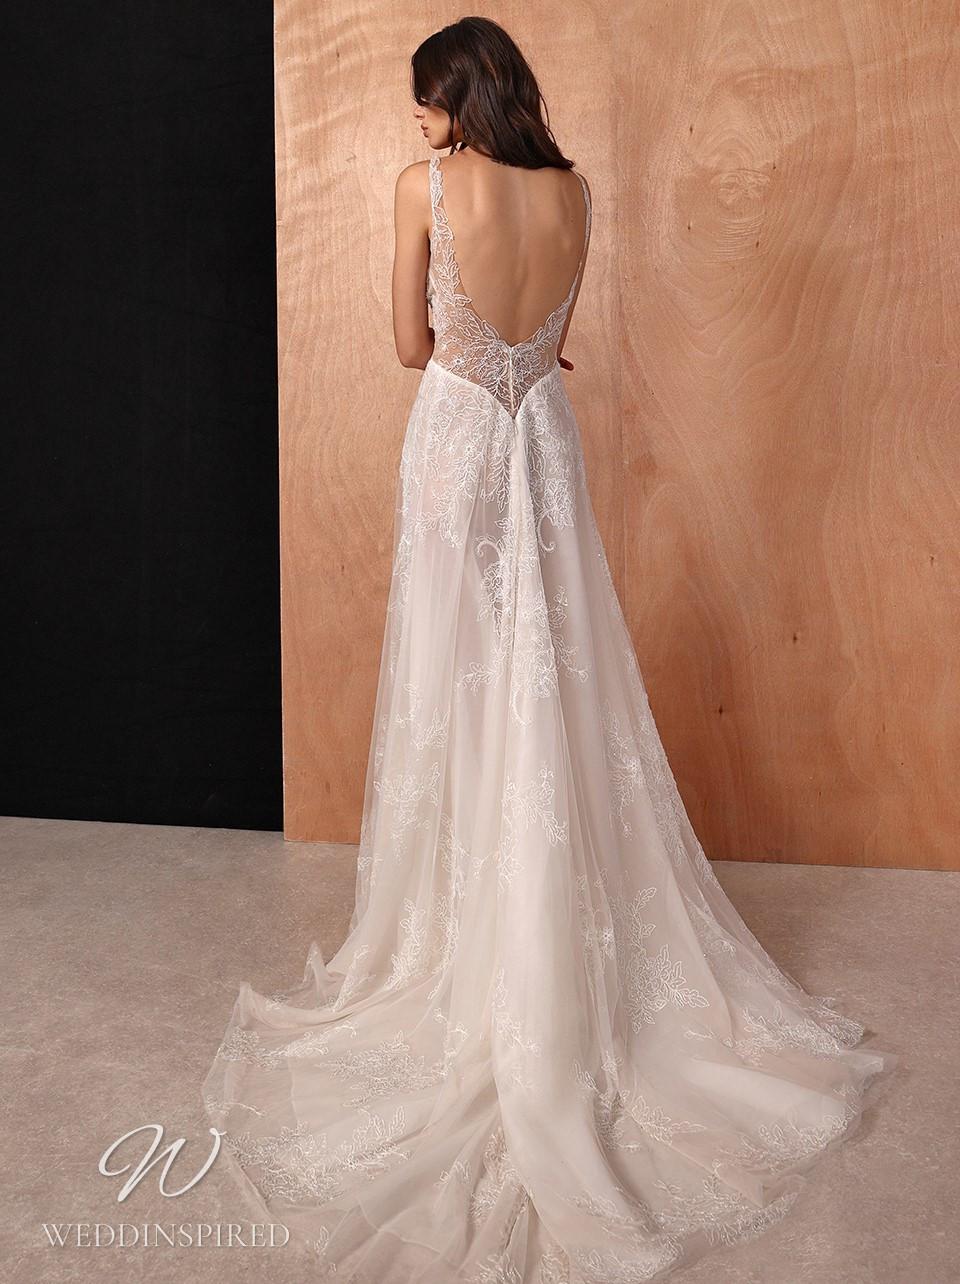 A Galia Lahav 2022 lace A-line wedding dress with an open back